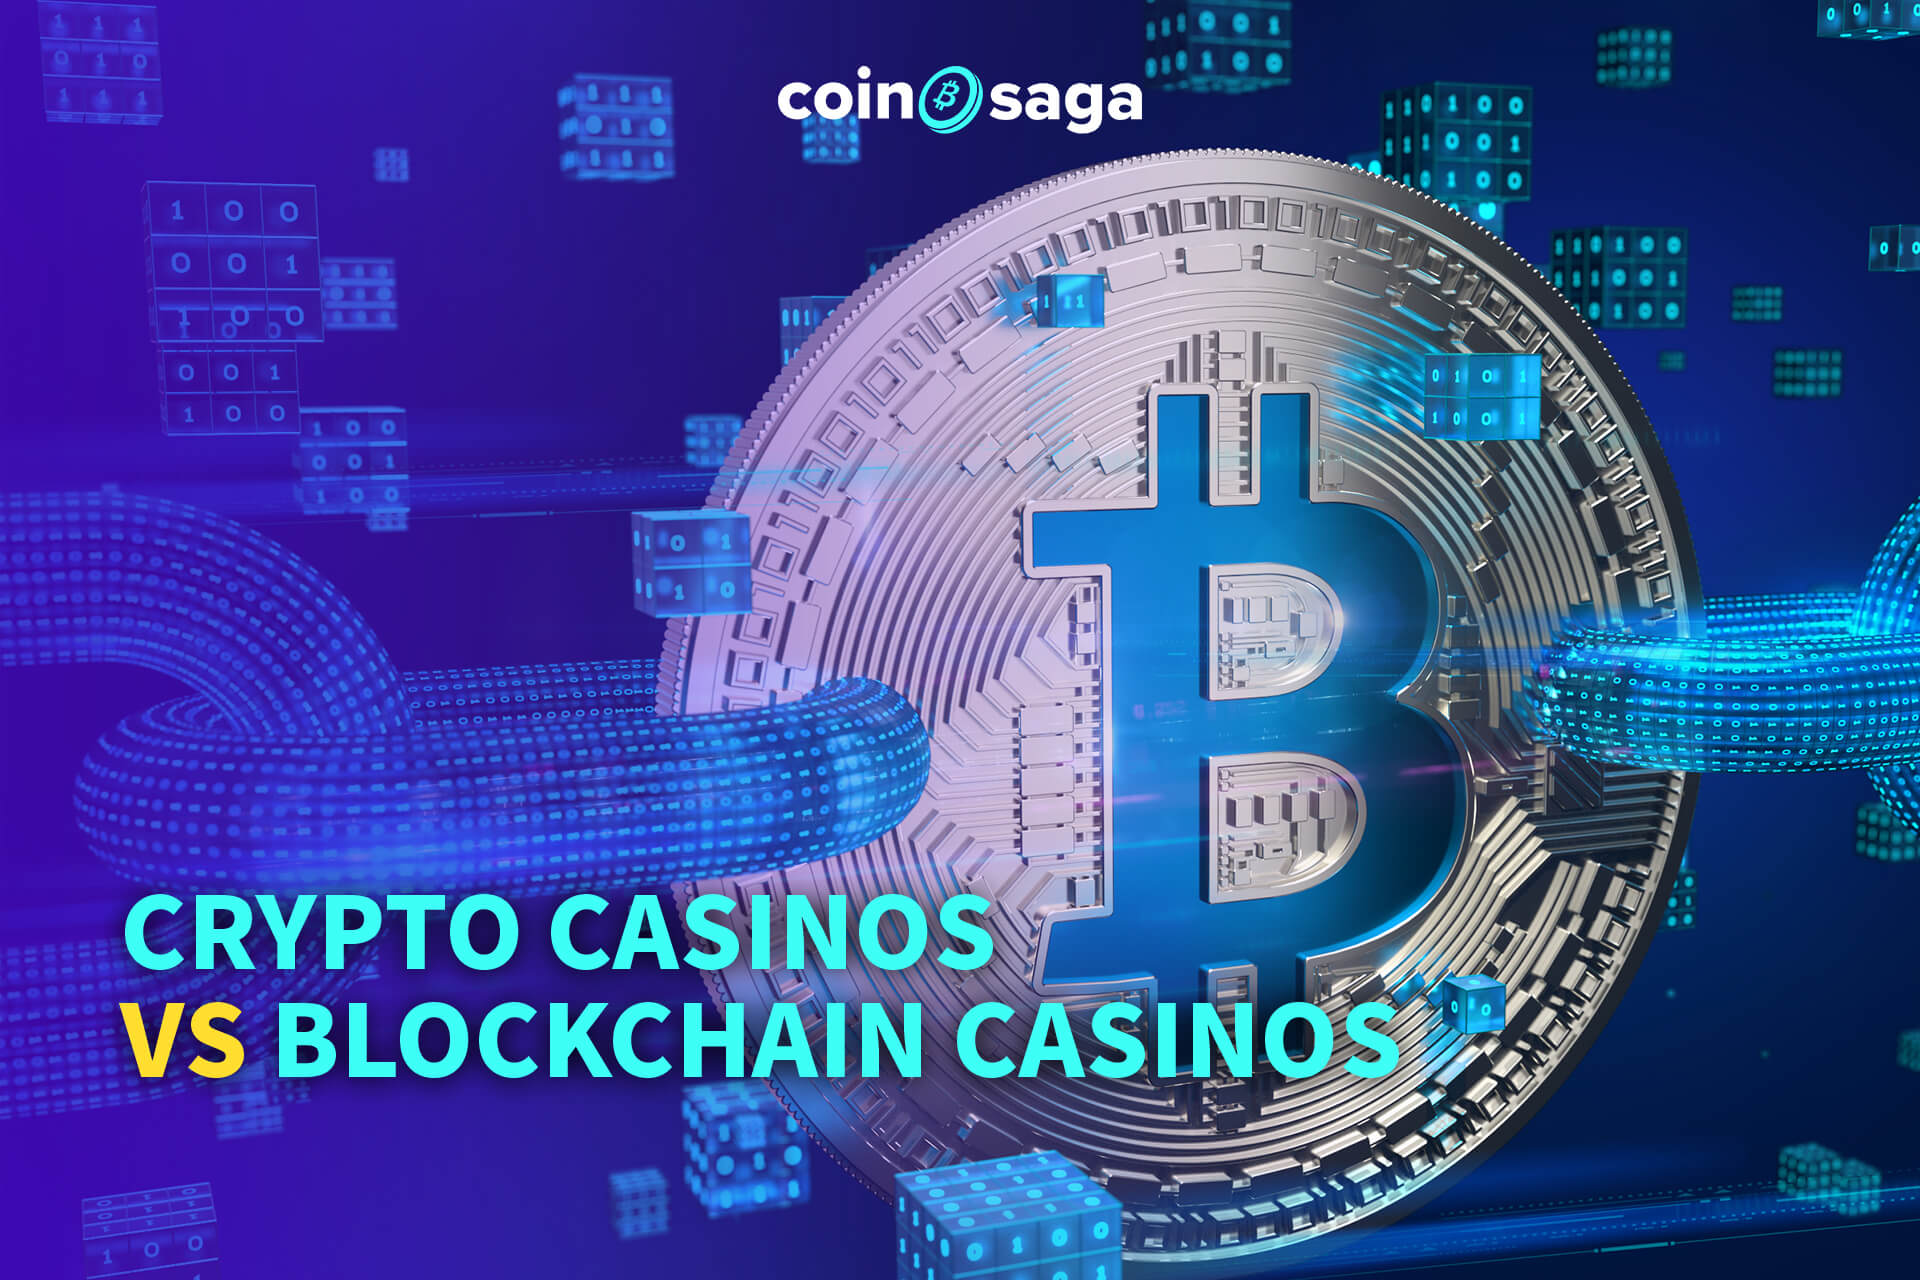 Crypto Casinos vs Blockchain Casinos